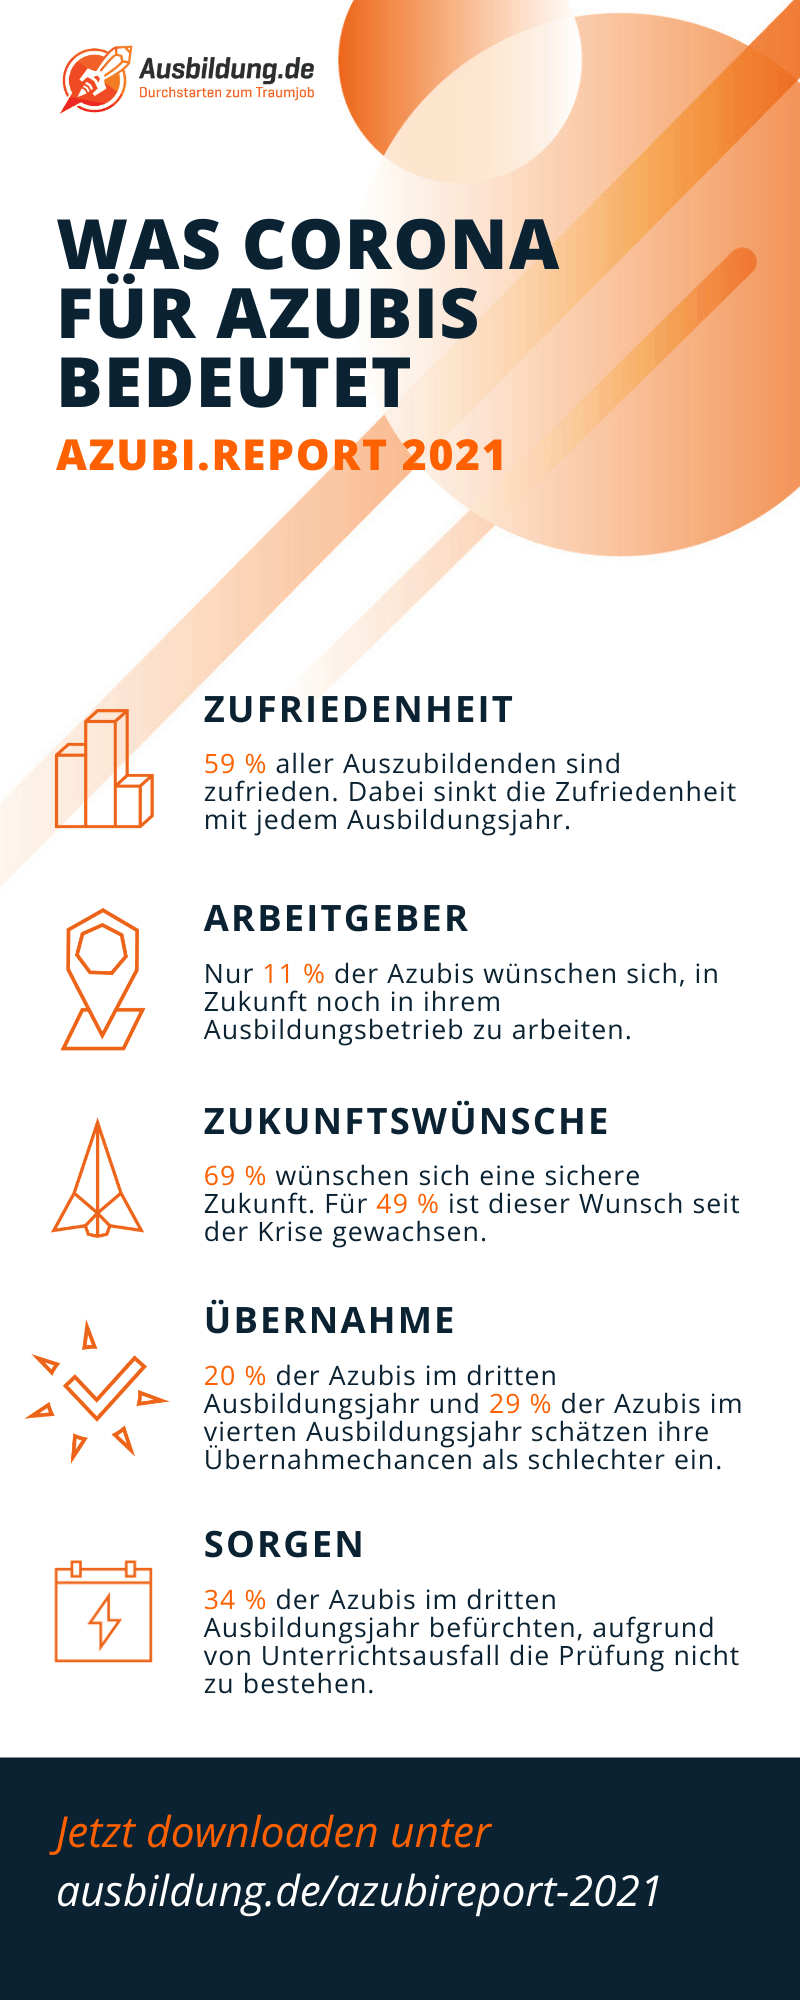 Infografik azubi.report 2021 SAATKORN